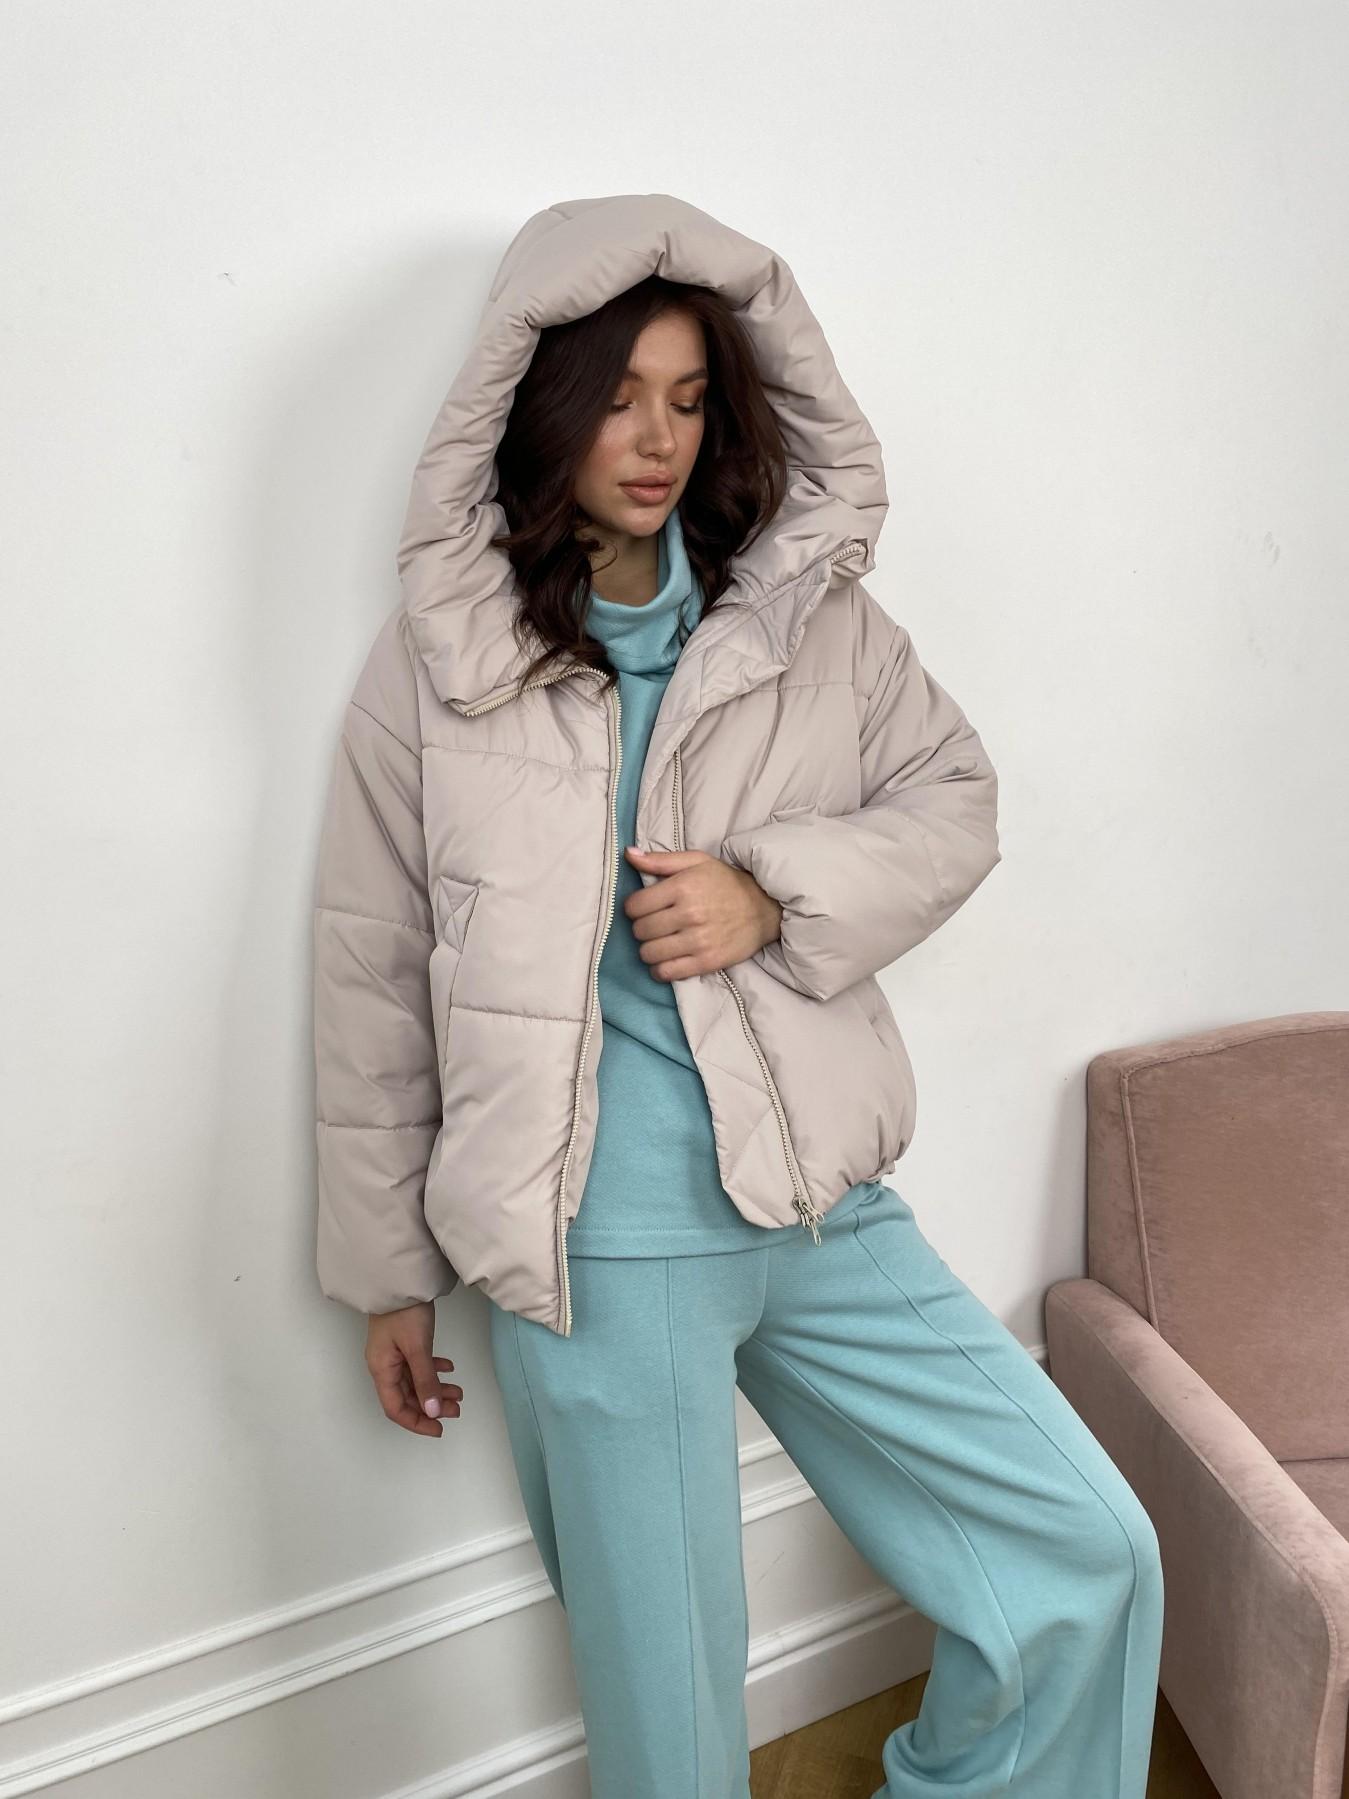 куртки оптом Украина  Нокс куртка из плащевой ткани 10535